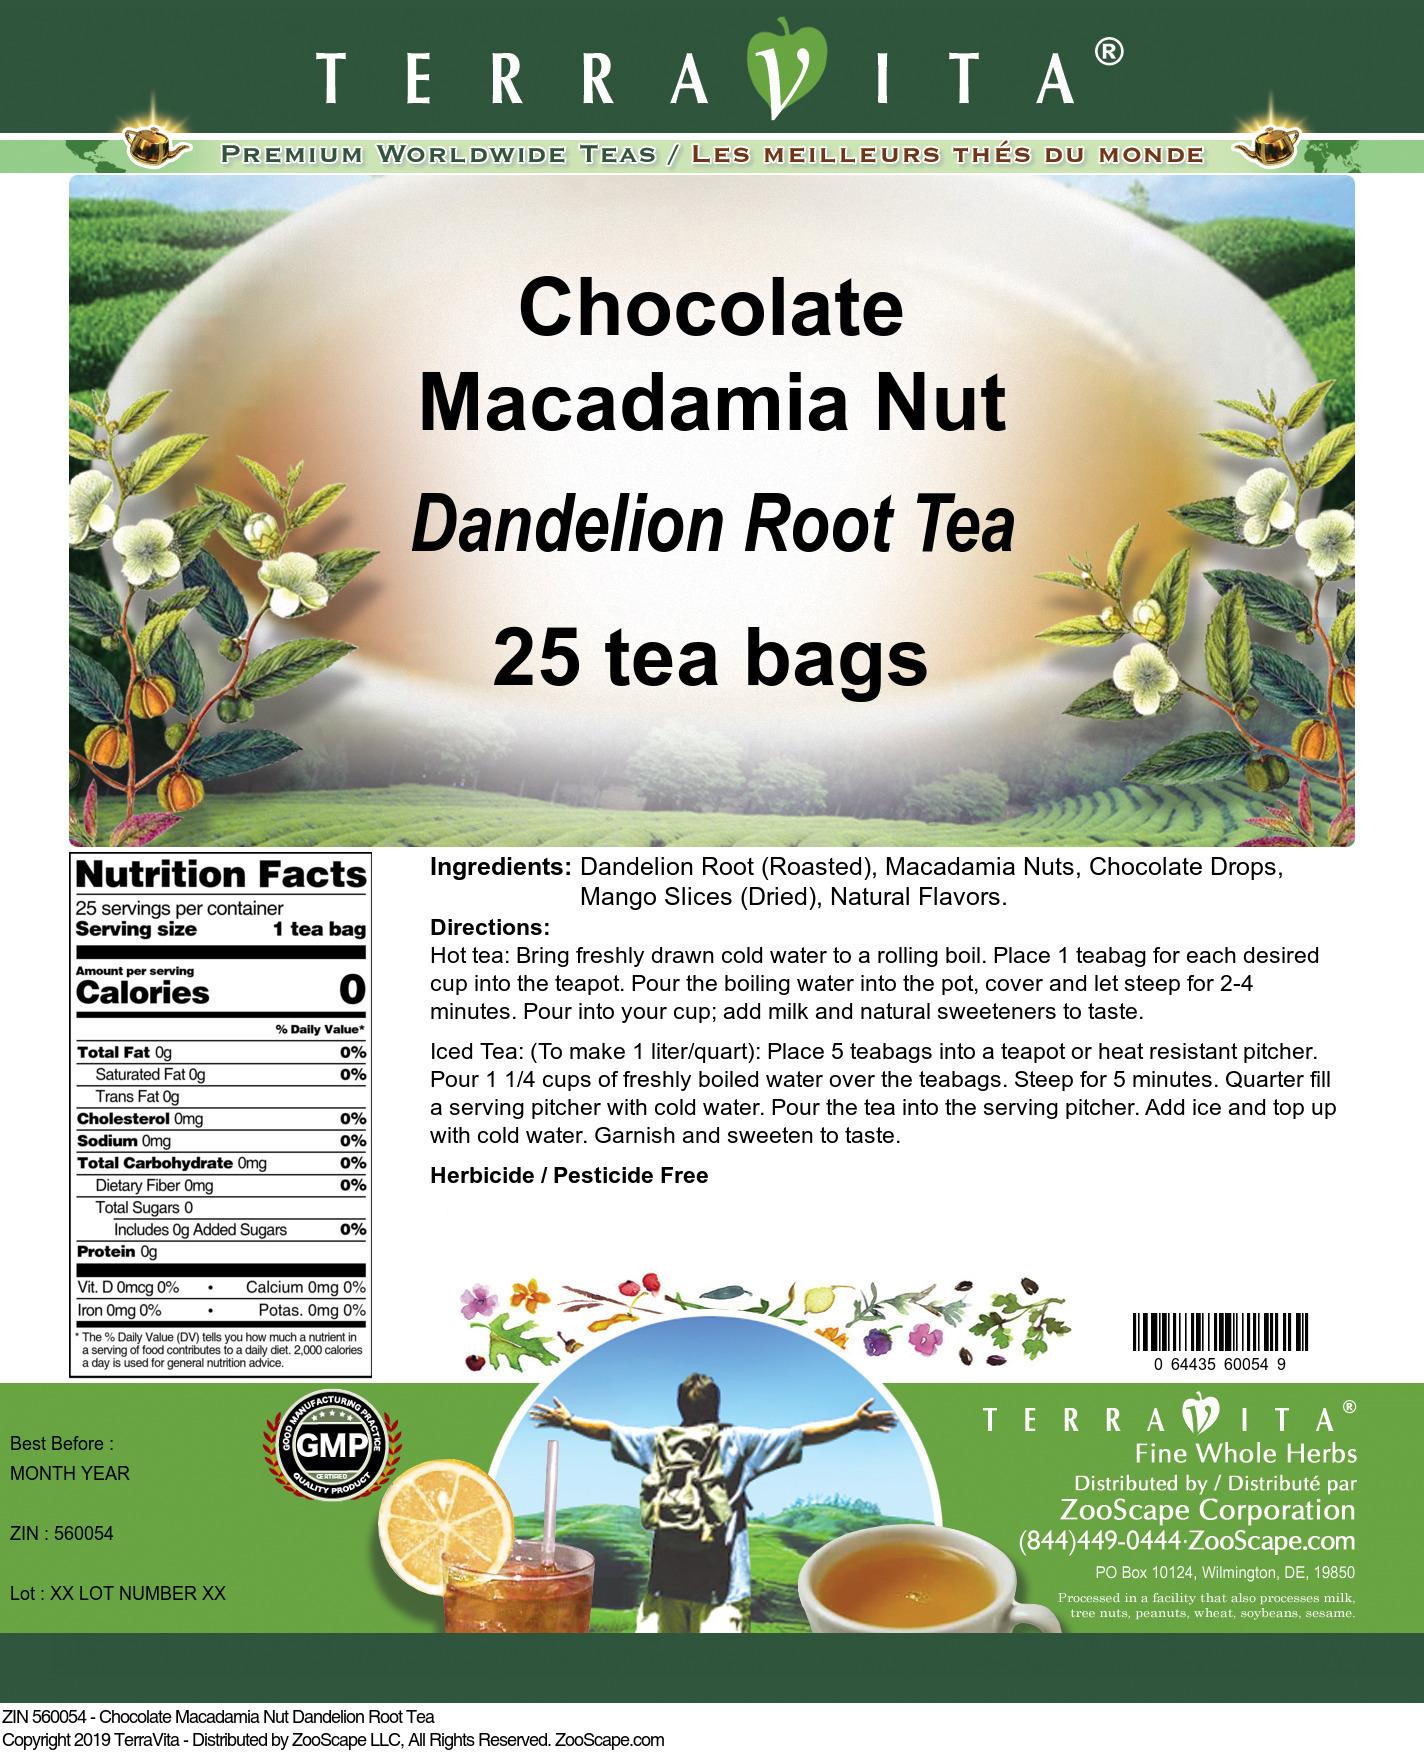 Chocolate Macadamia Nut Dandelion Root